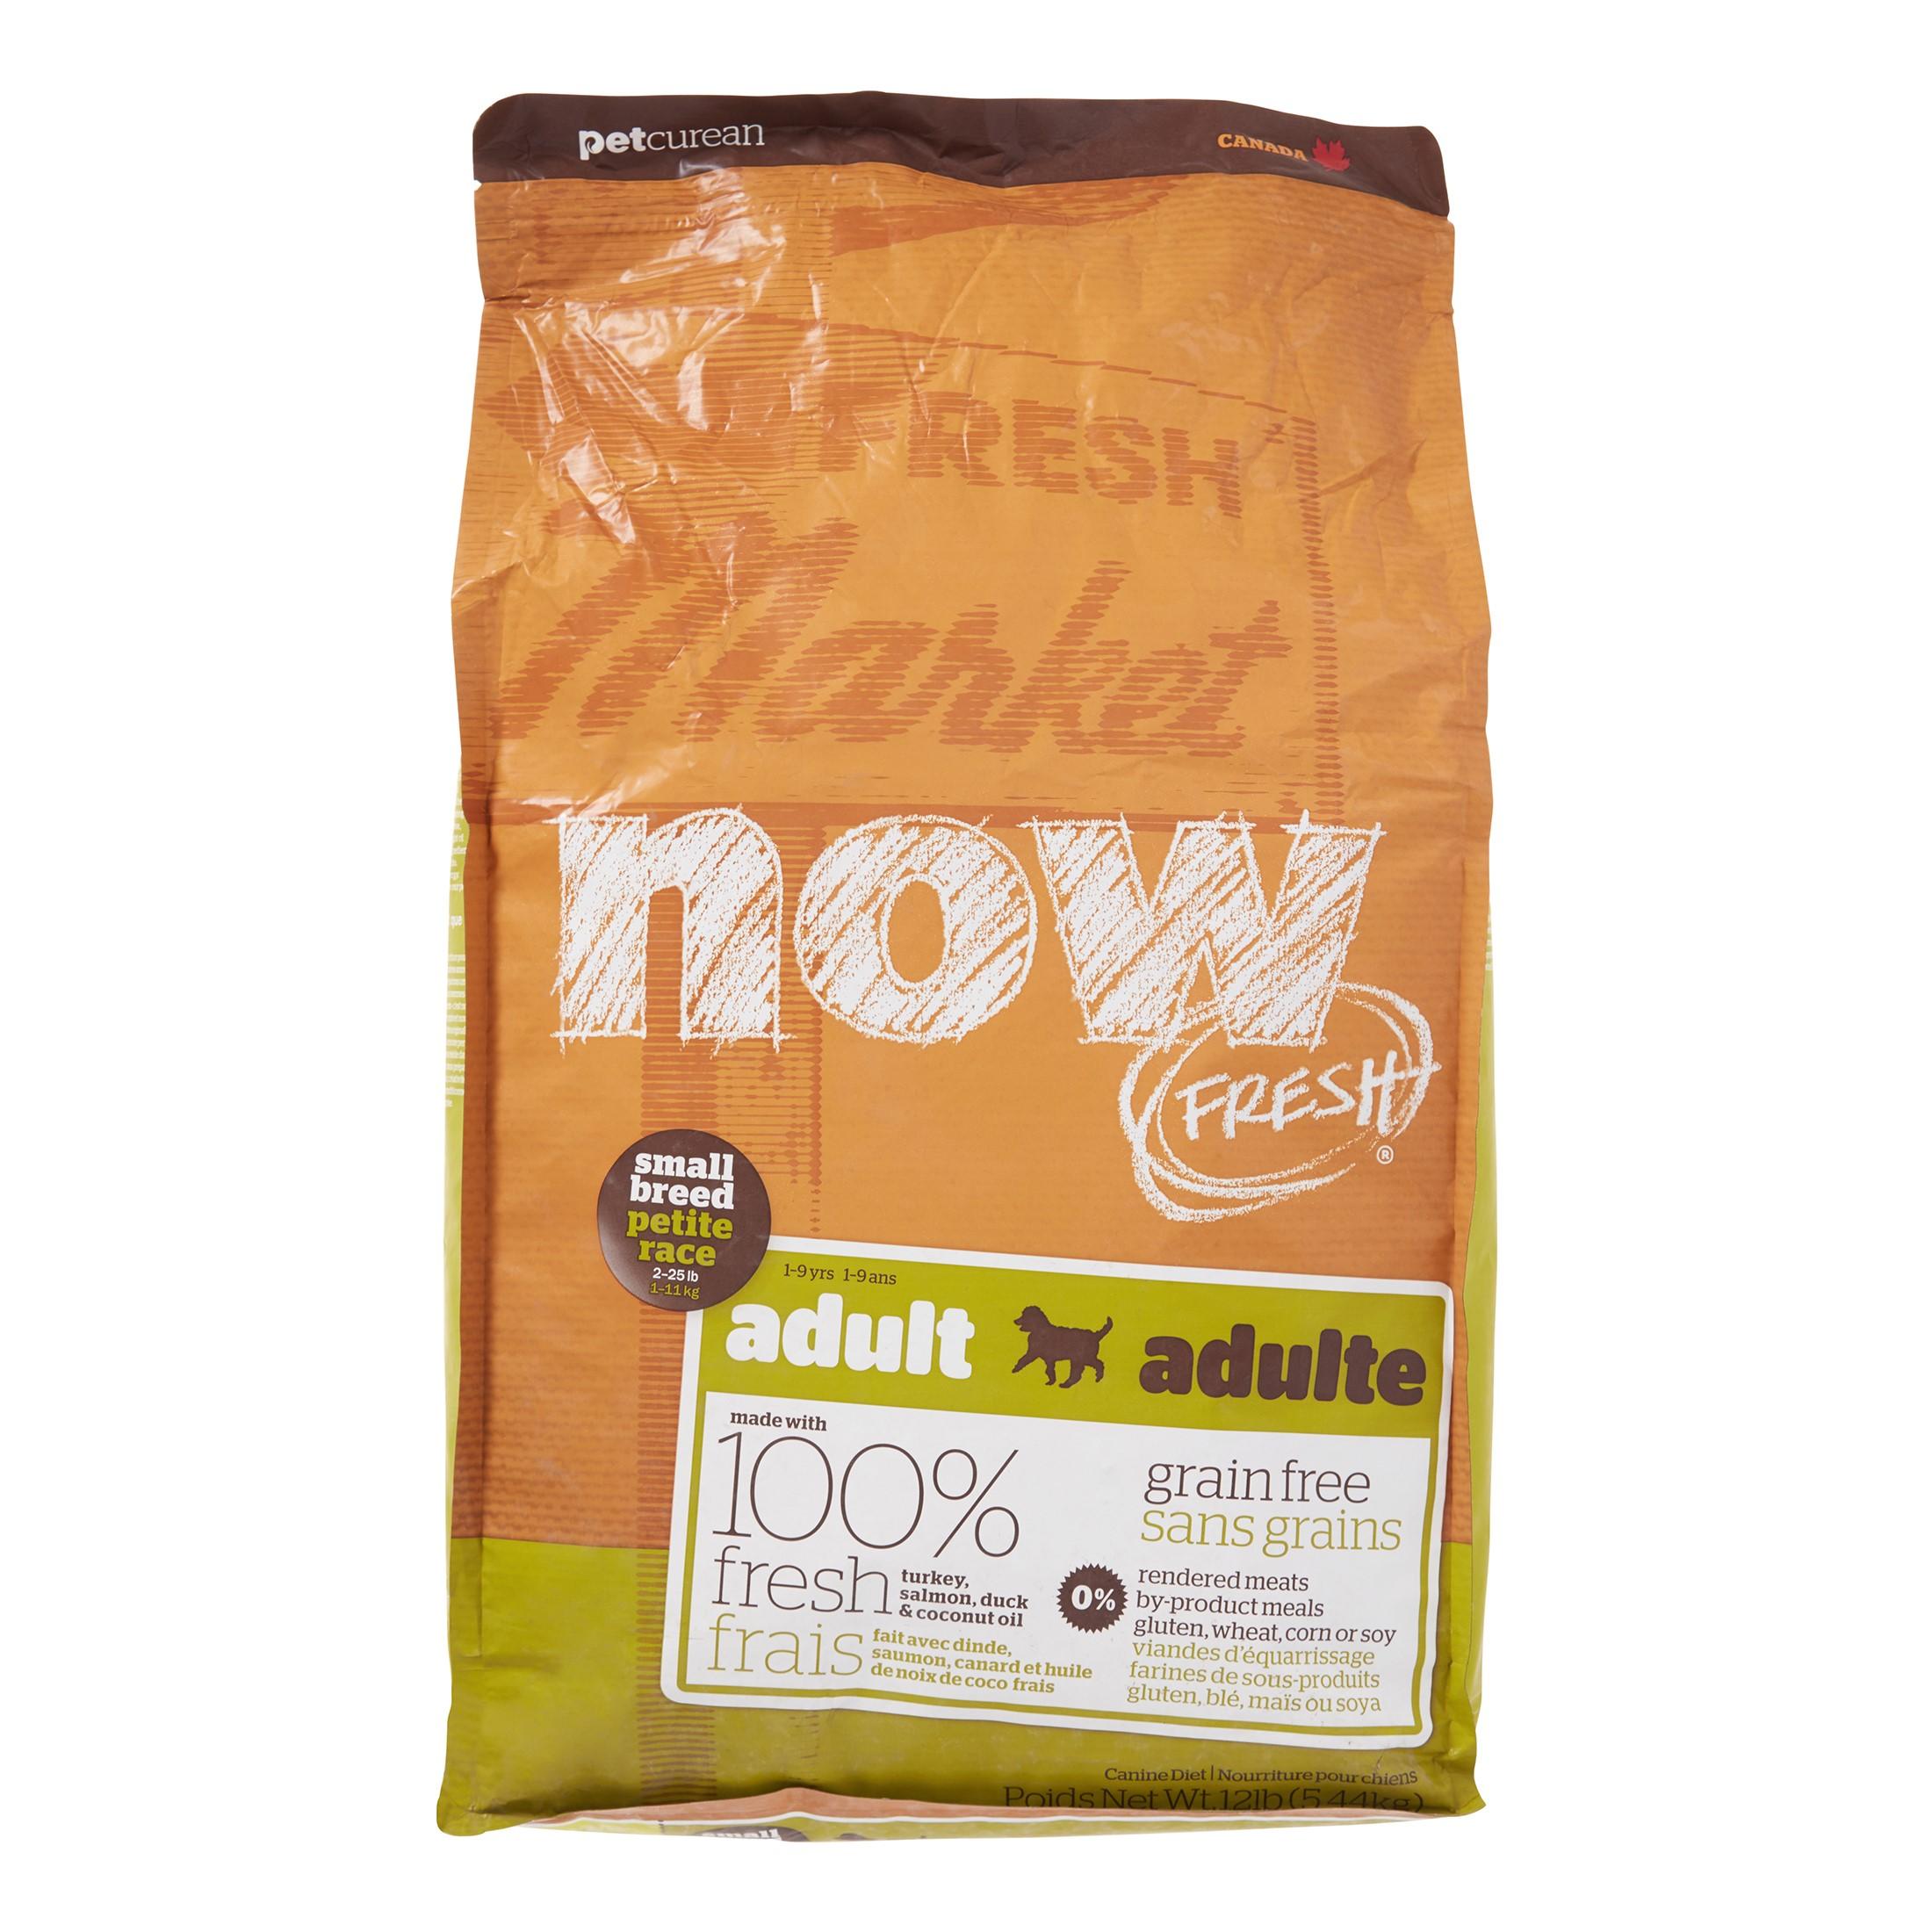 Petcurean Now Fresh Grain-Free Small Breed Adult Recipe Dry Dog Food, 12 Lb